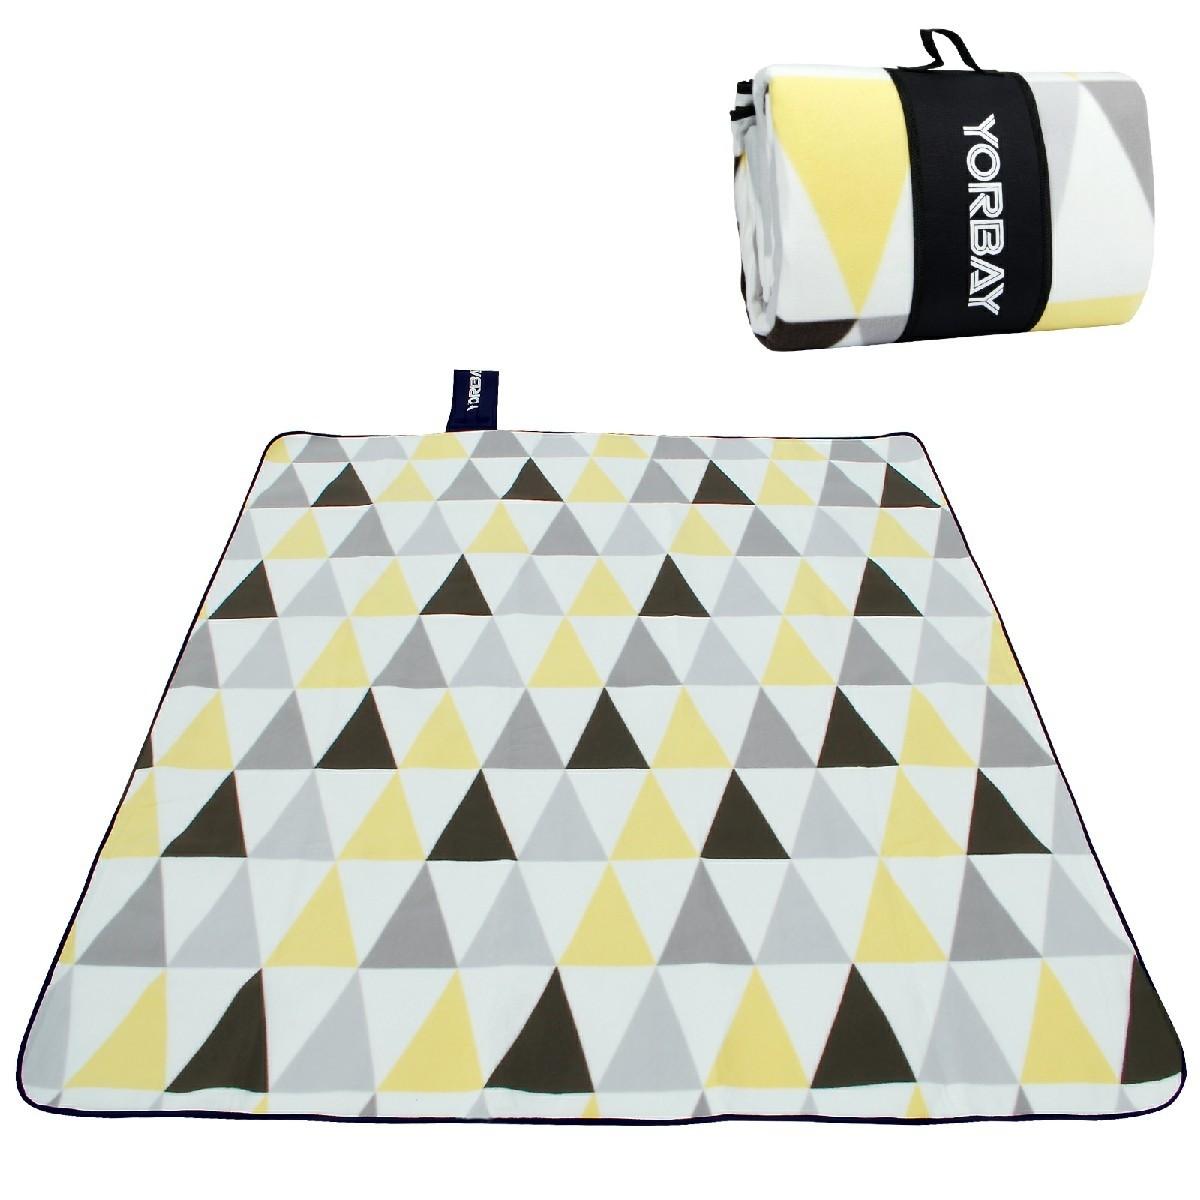 campingdecke-yorbay-06